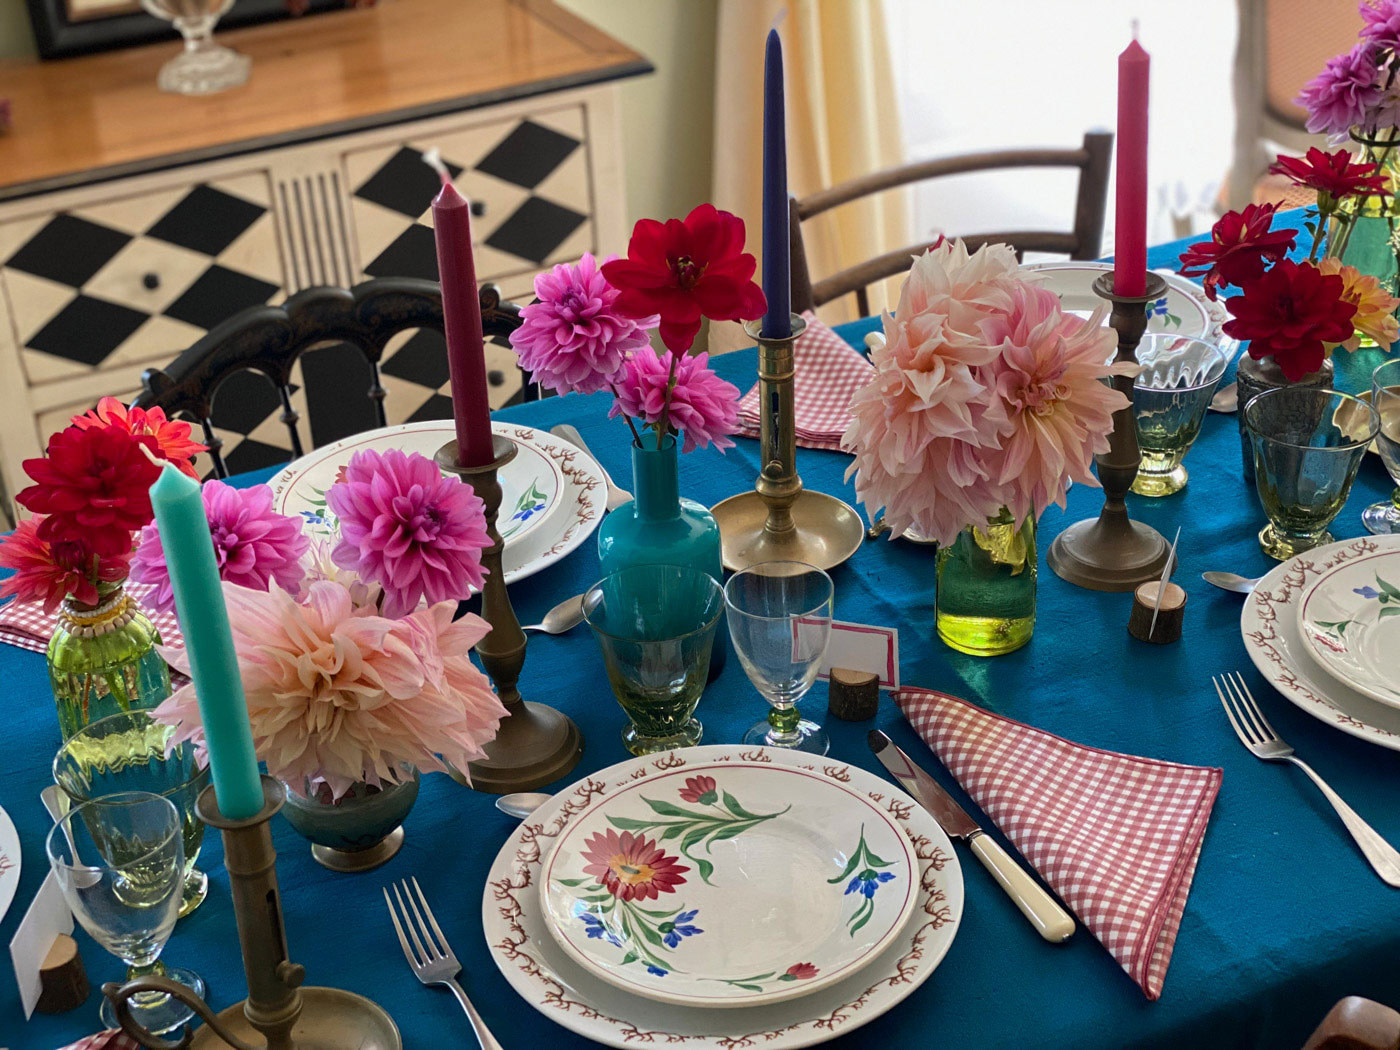 dresser-table-art-dahlias-tablescape-how-to-set-table-06